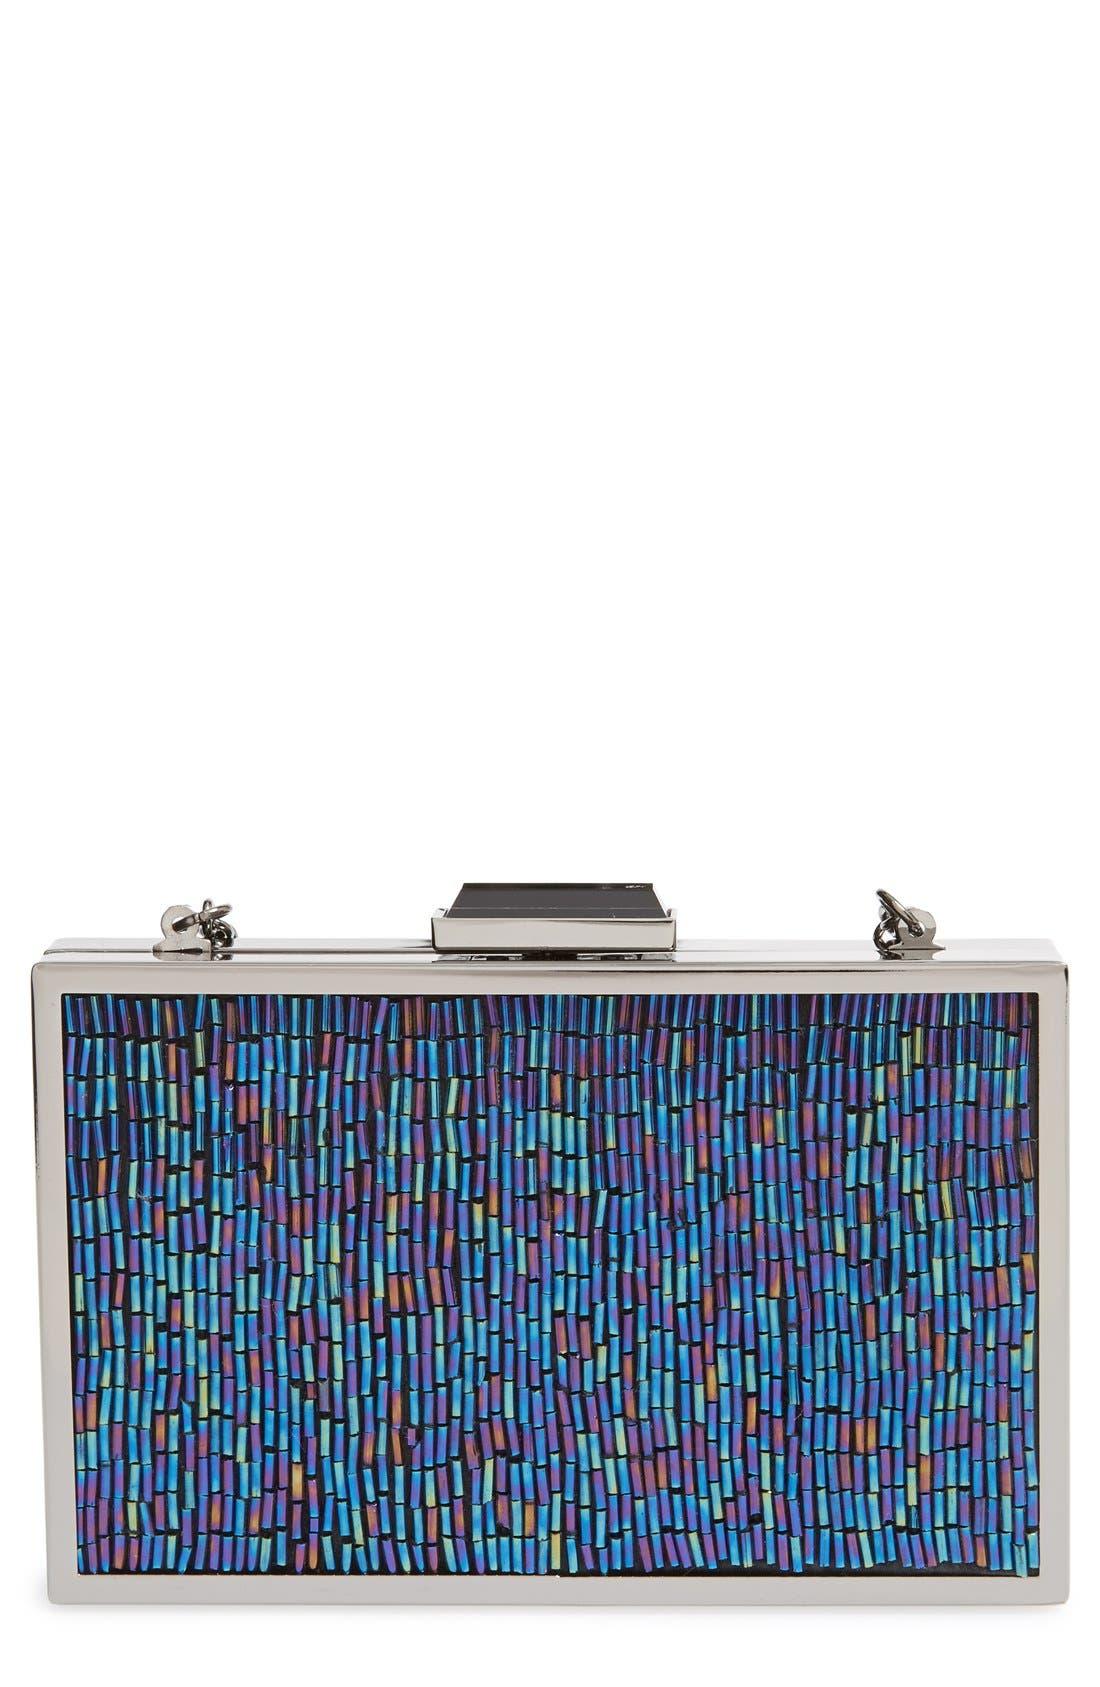 Main Image - Jessica McClintock 'Oilspill' Beaded Box Clutch